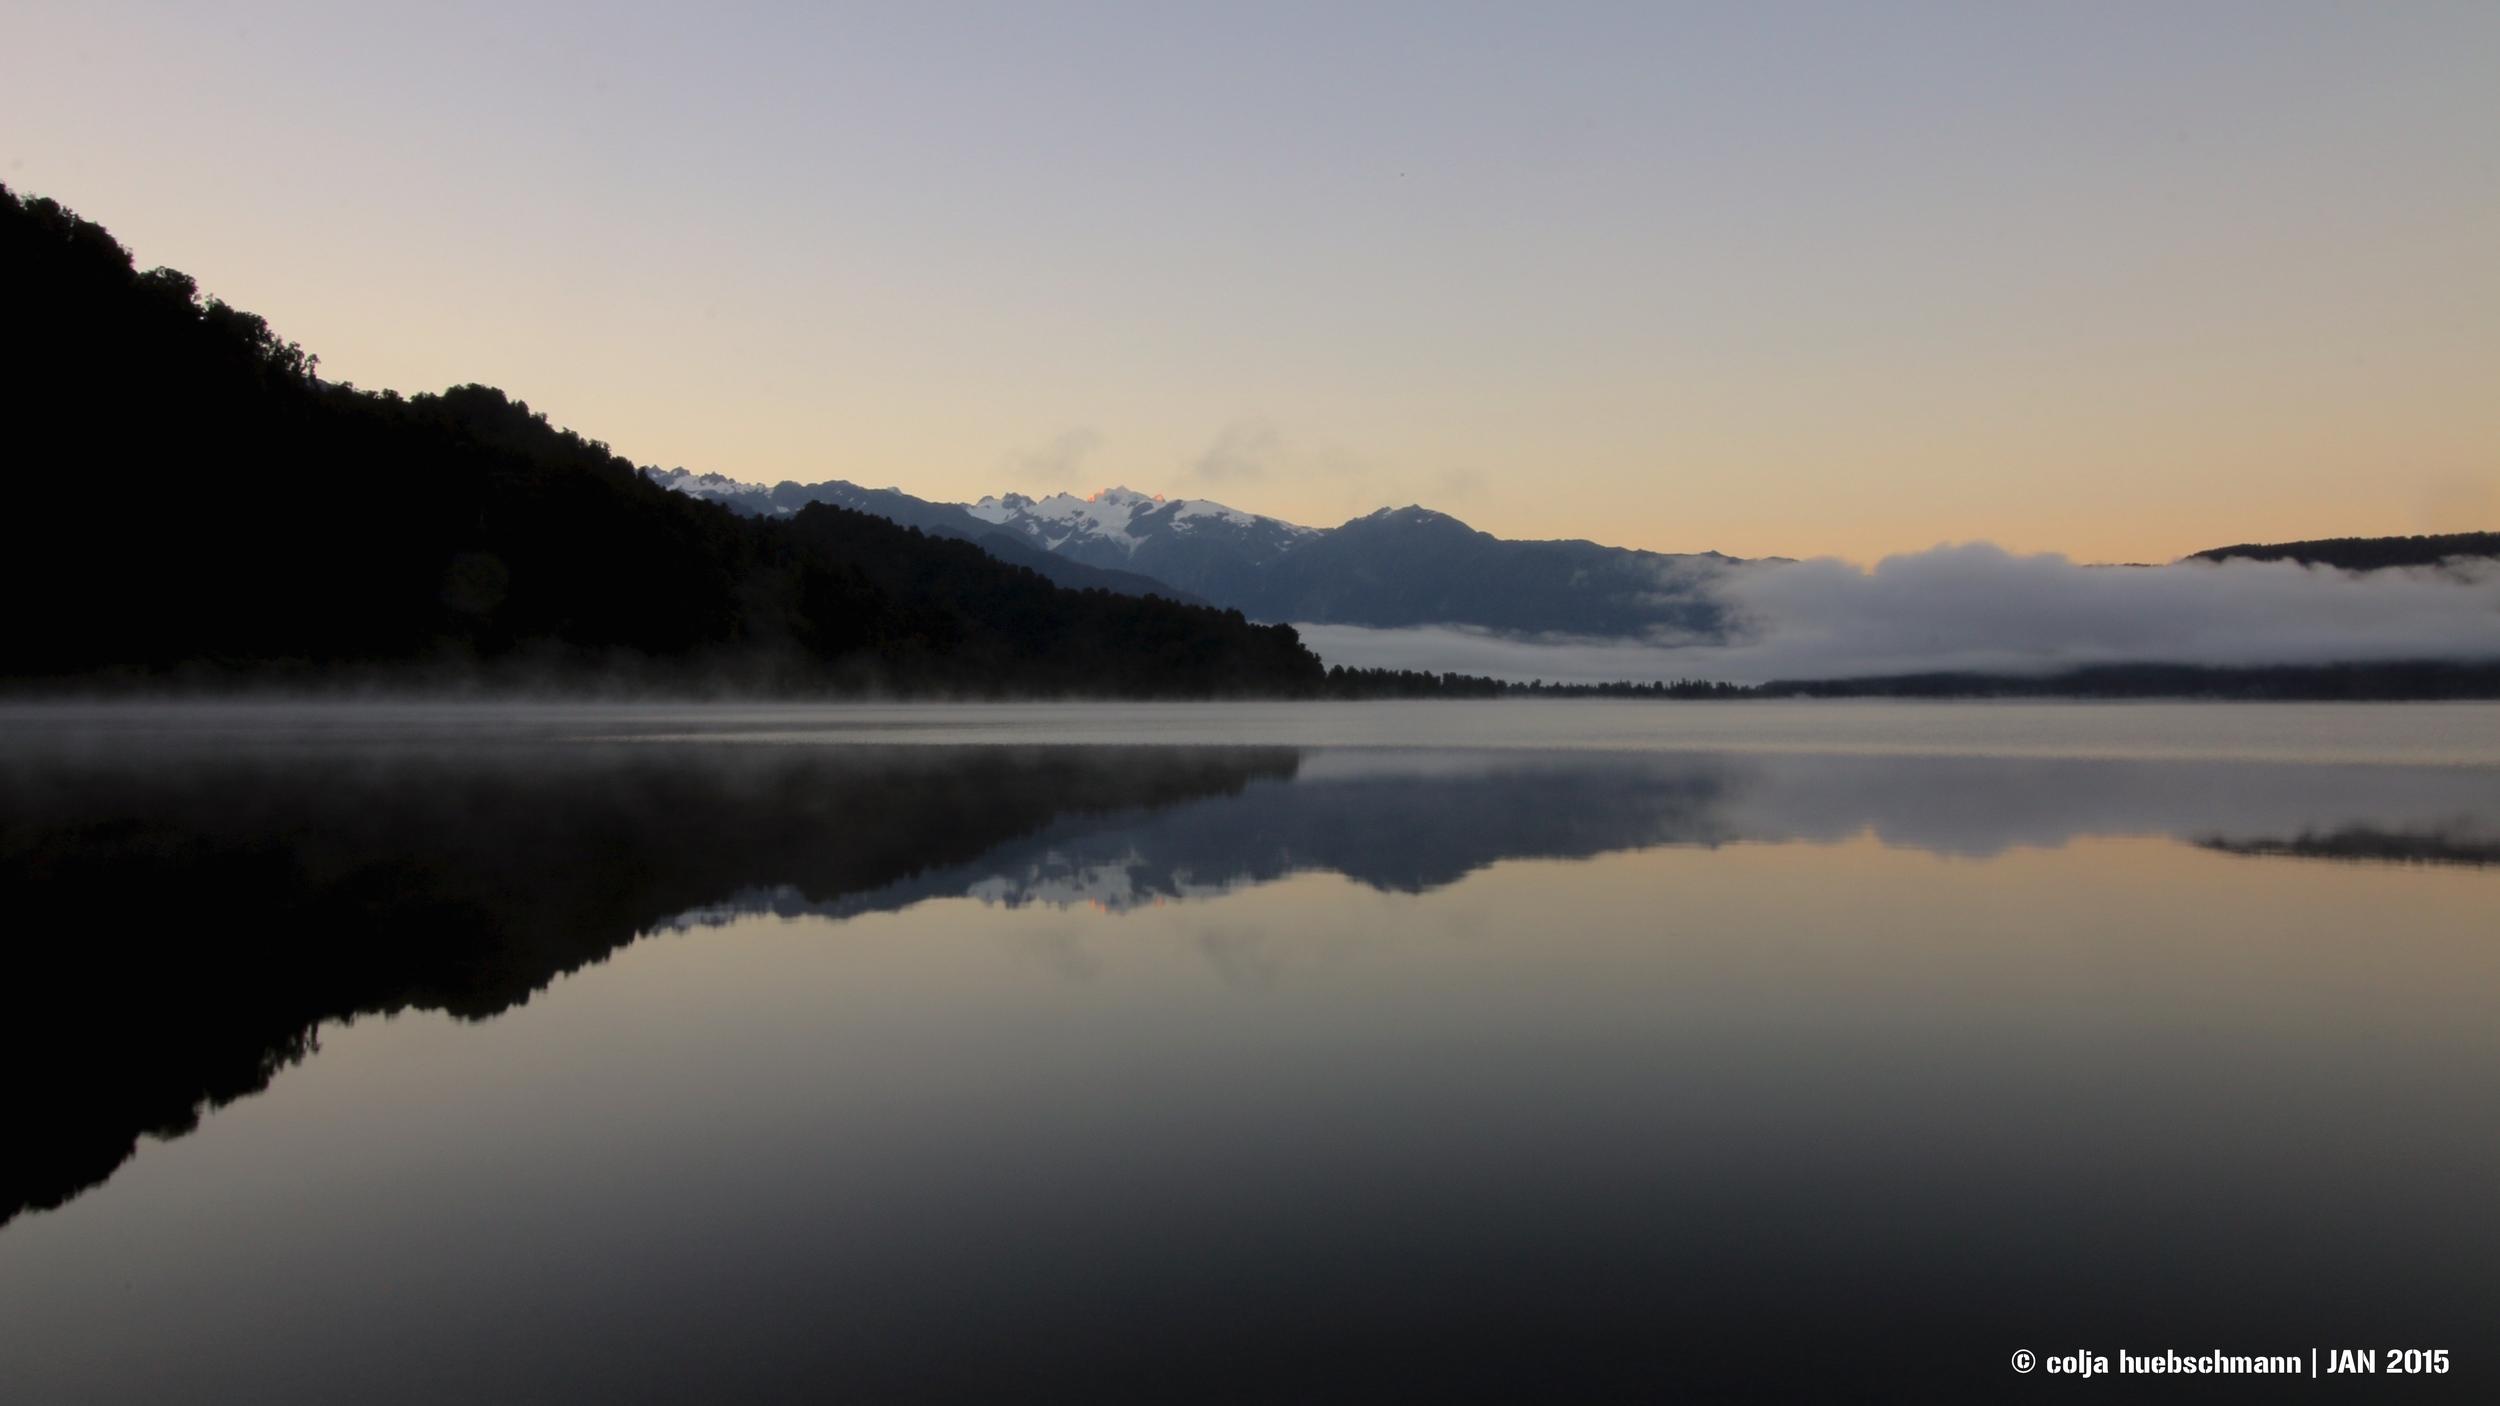 lake mapourika, west coast, glacier area